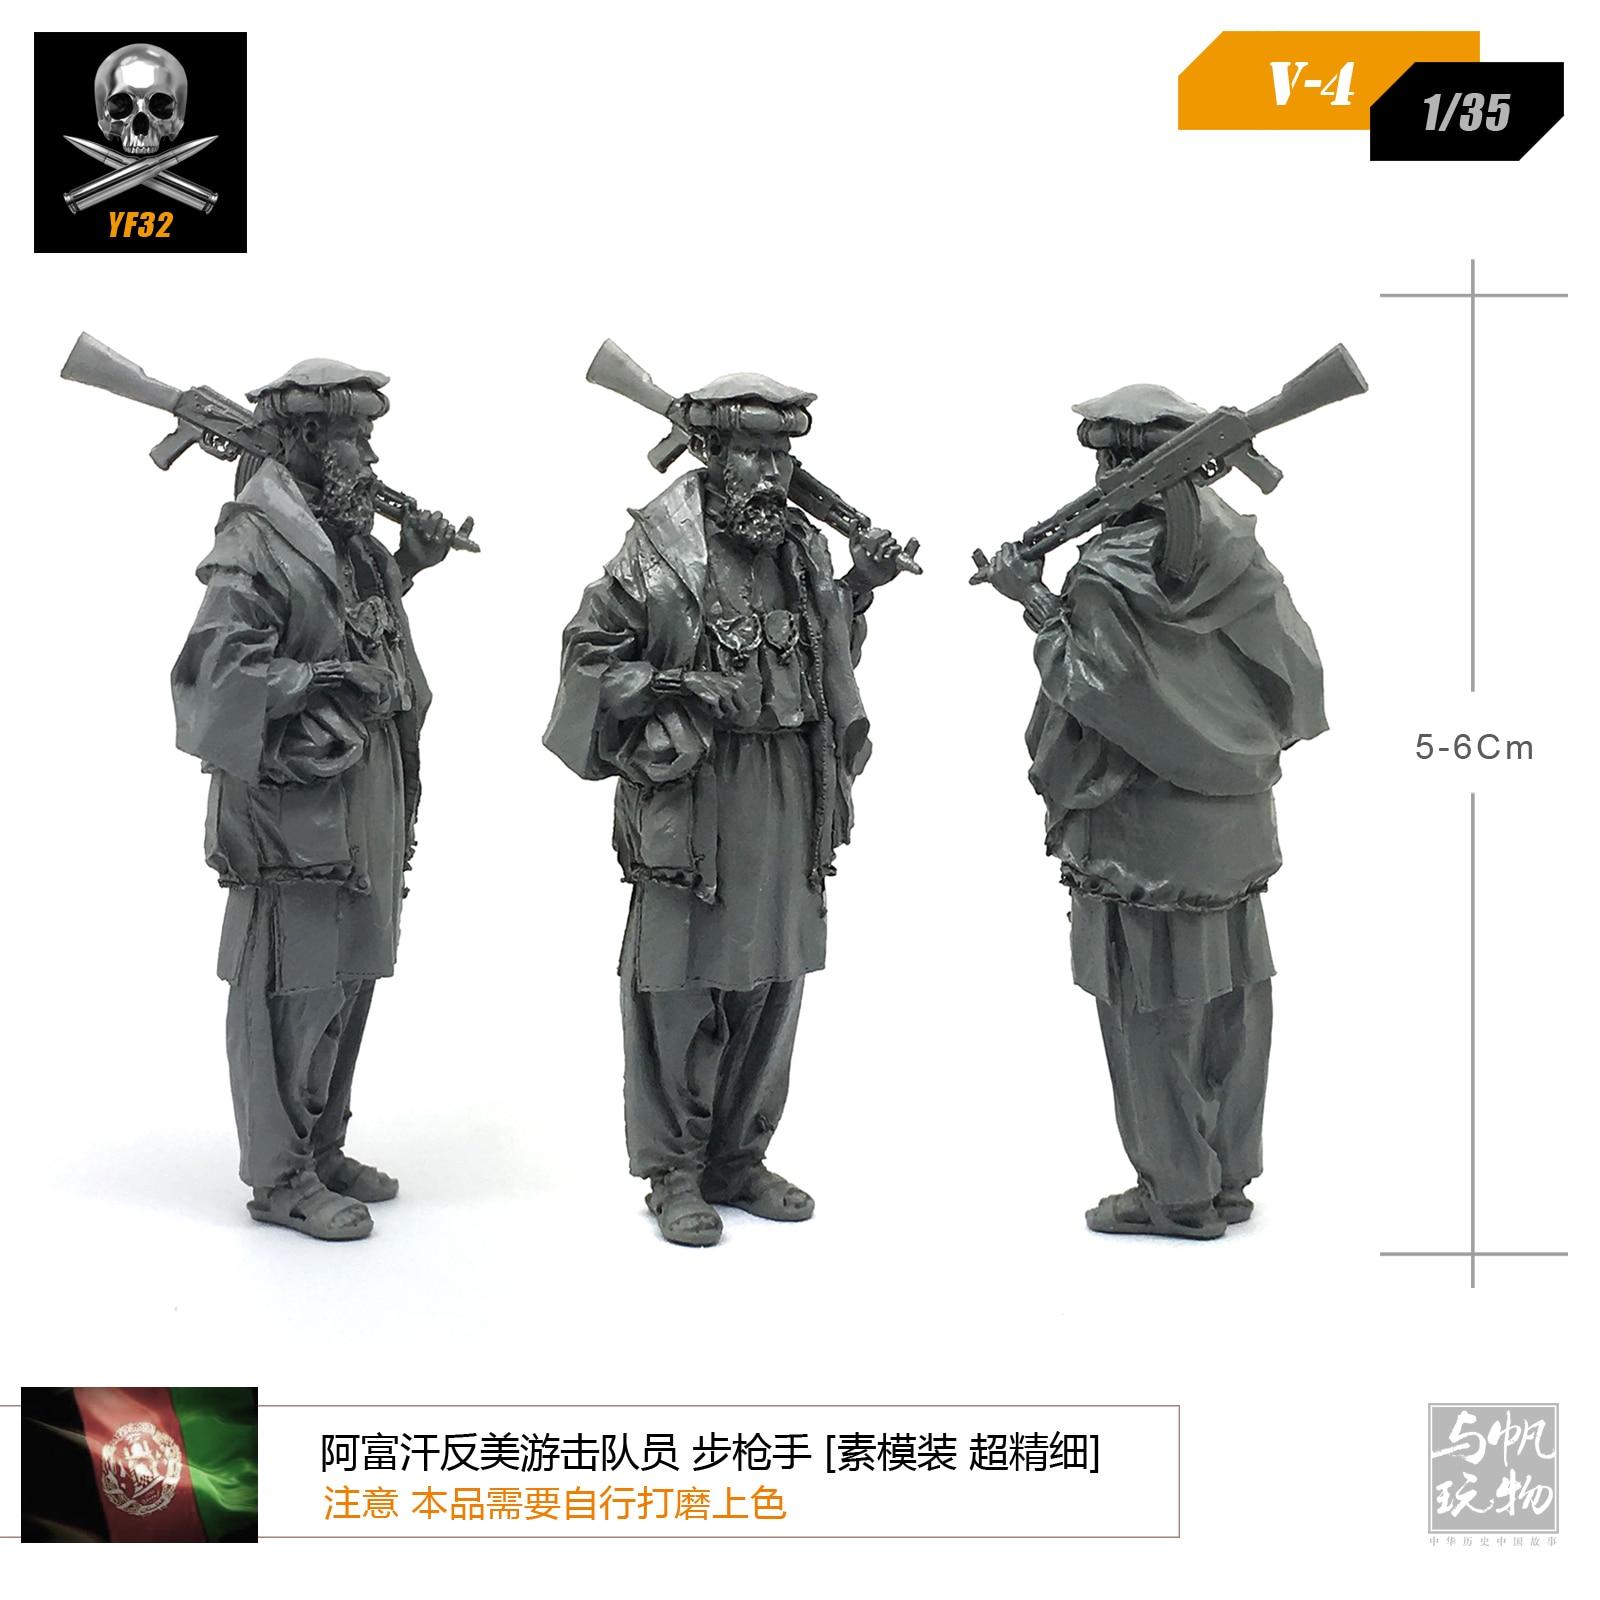 1/35 Figure Kits Resin Soldier Afghanistan Semi-finished  Self-assembled  V4